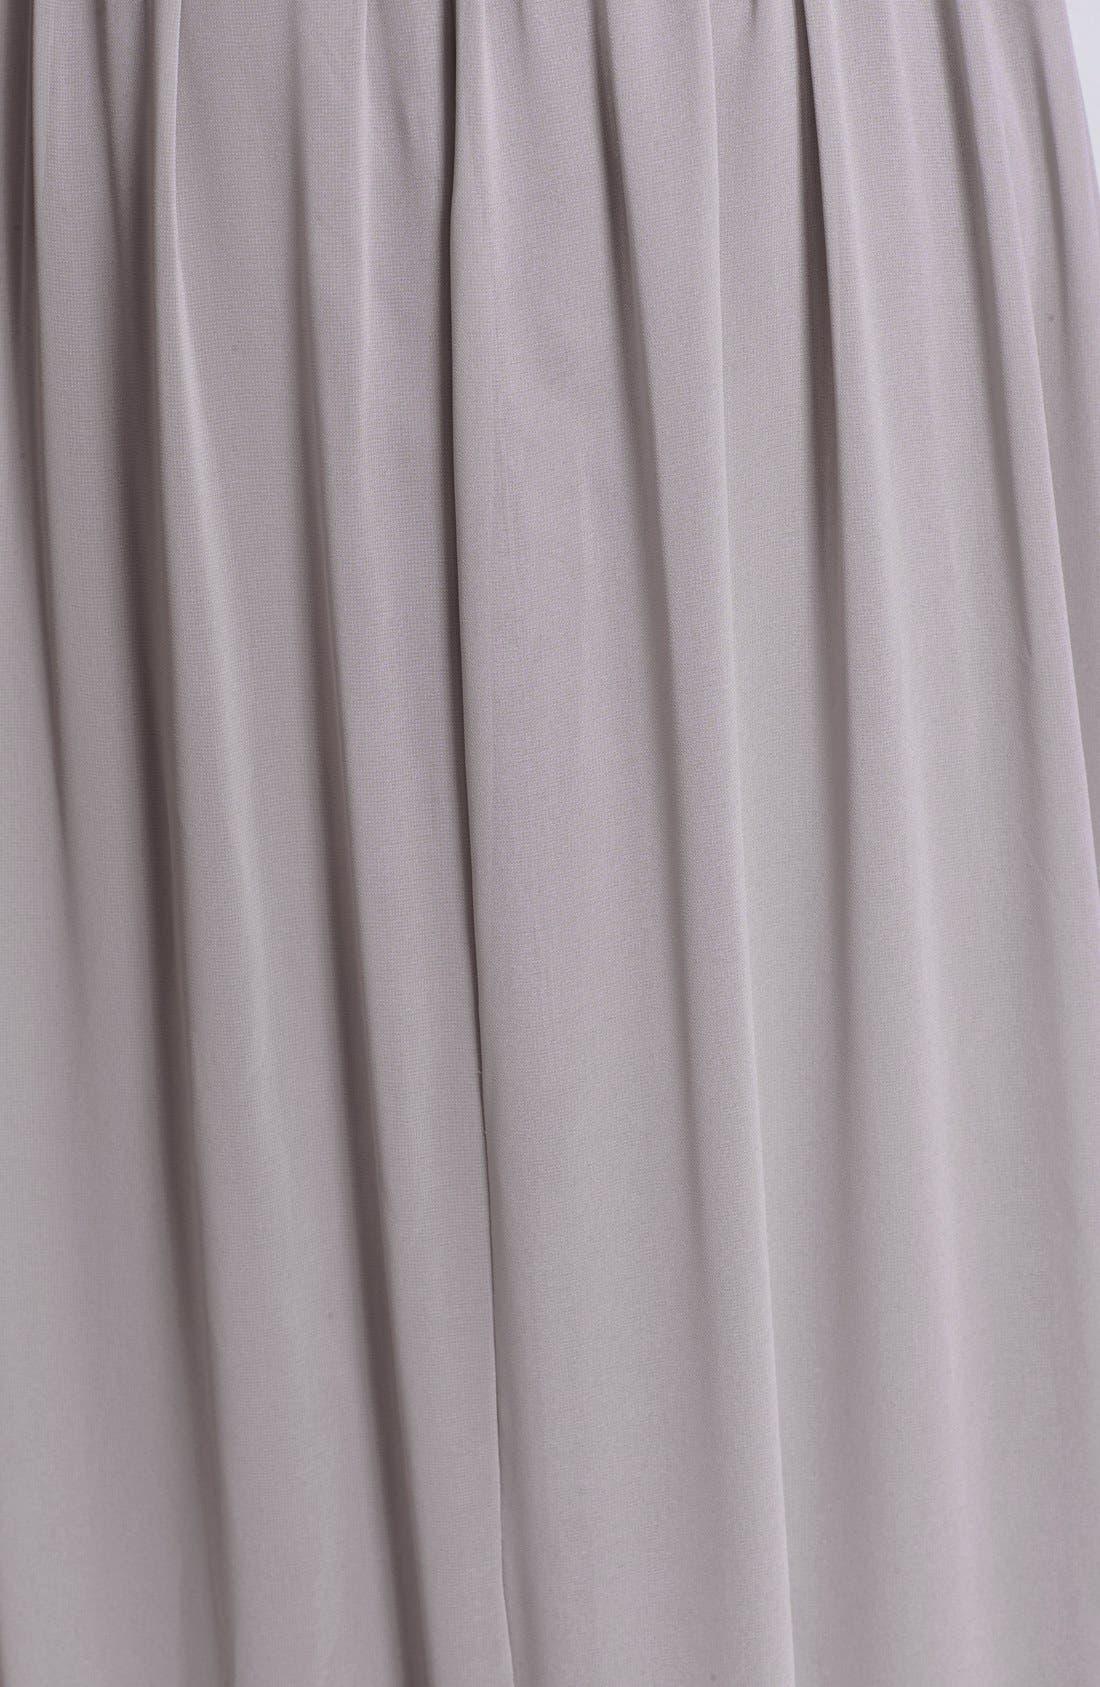 Alternate Image 3  - Donna Morgan 'Audrey' Strapless Chiffon Gown